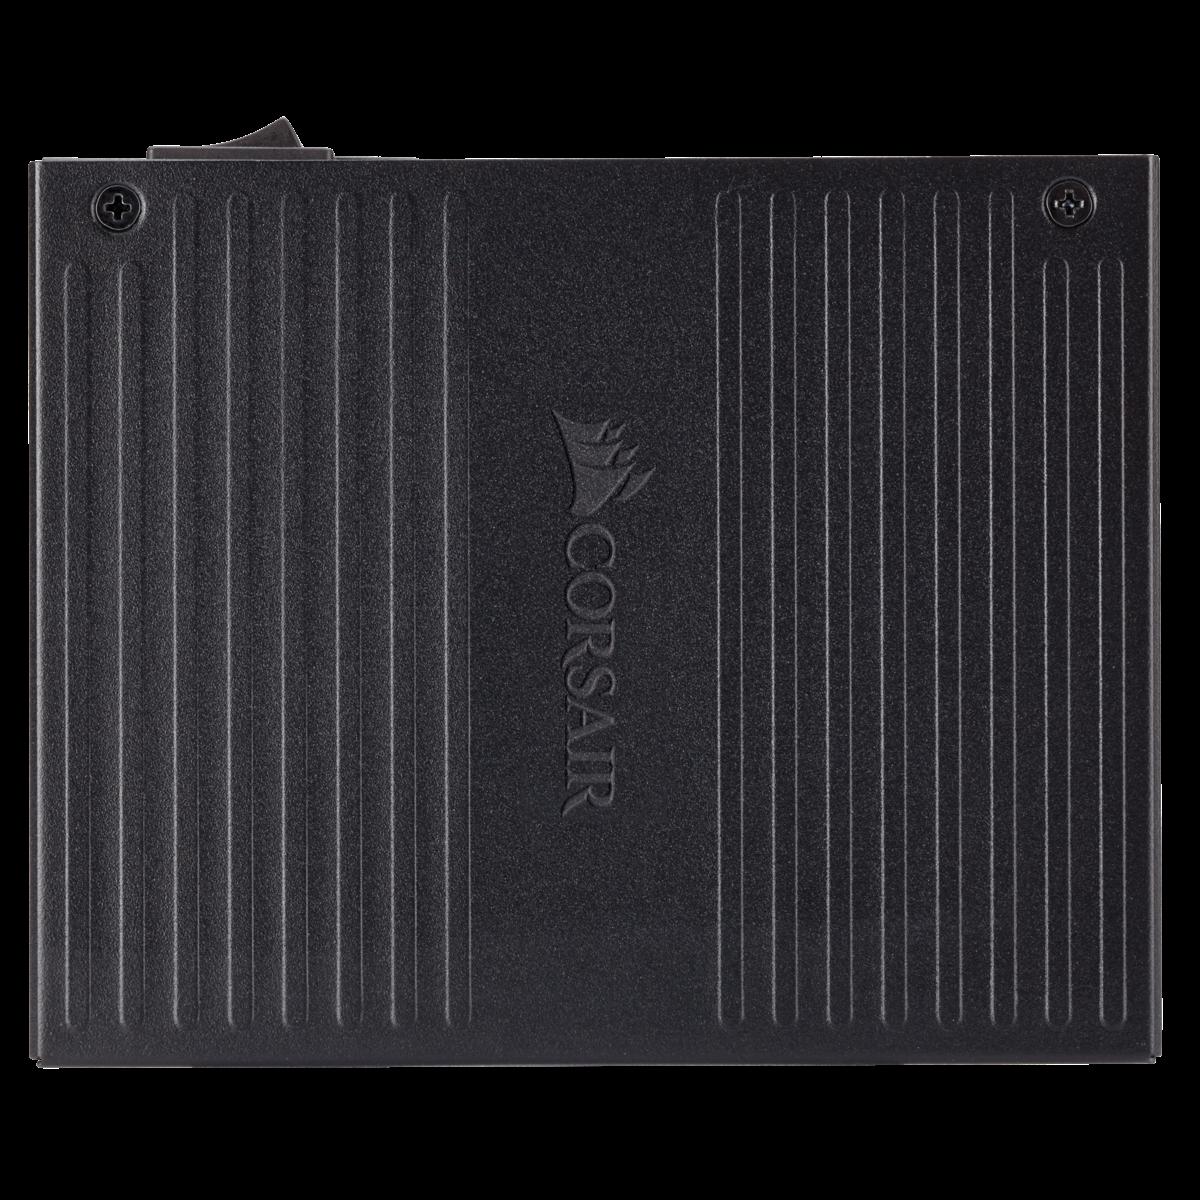 (750W) Corsair SF750 80 Plus Platinum